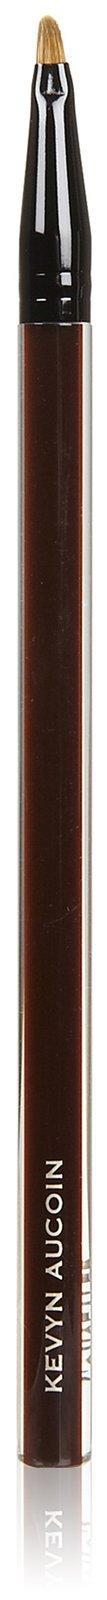 Kevyn Aucoin Beauty Concealer Brush